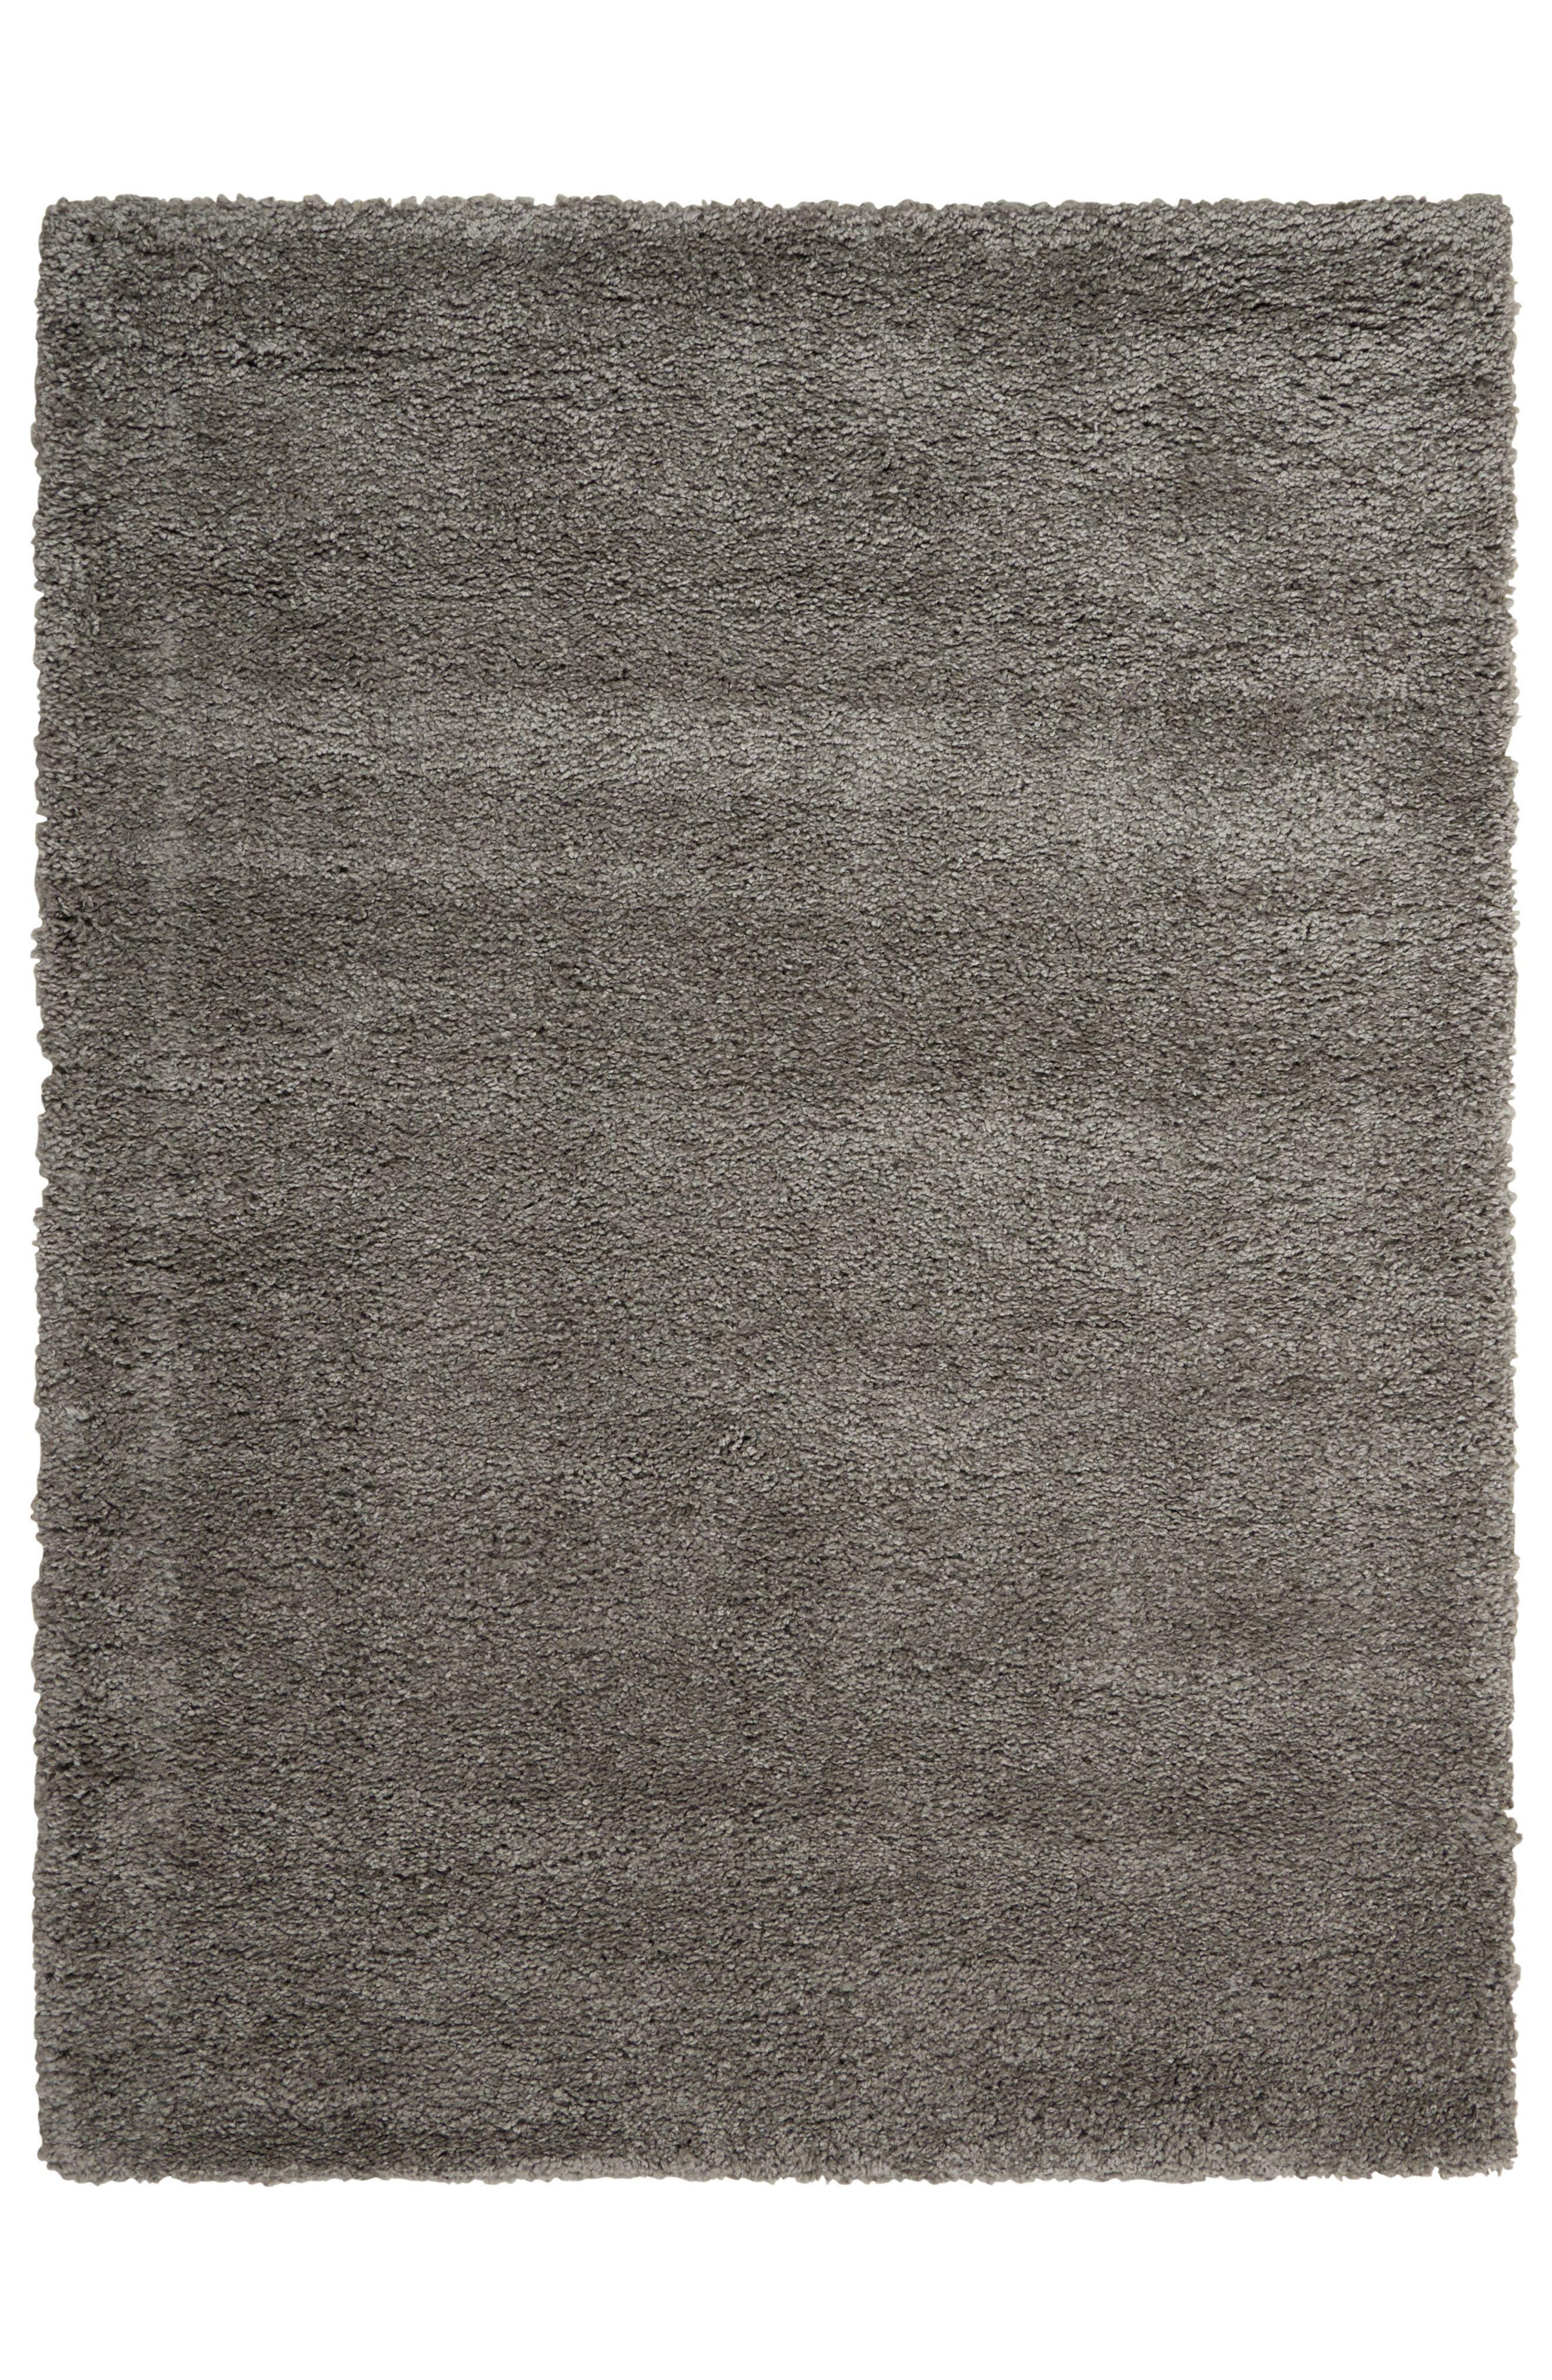 Riad Collection Shag Pile Area Rug,                         Main,                         color, Grey